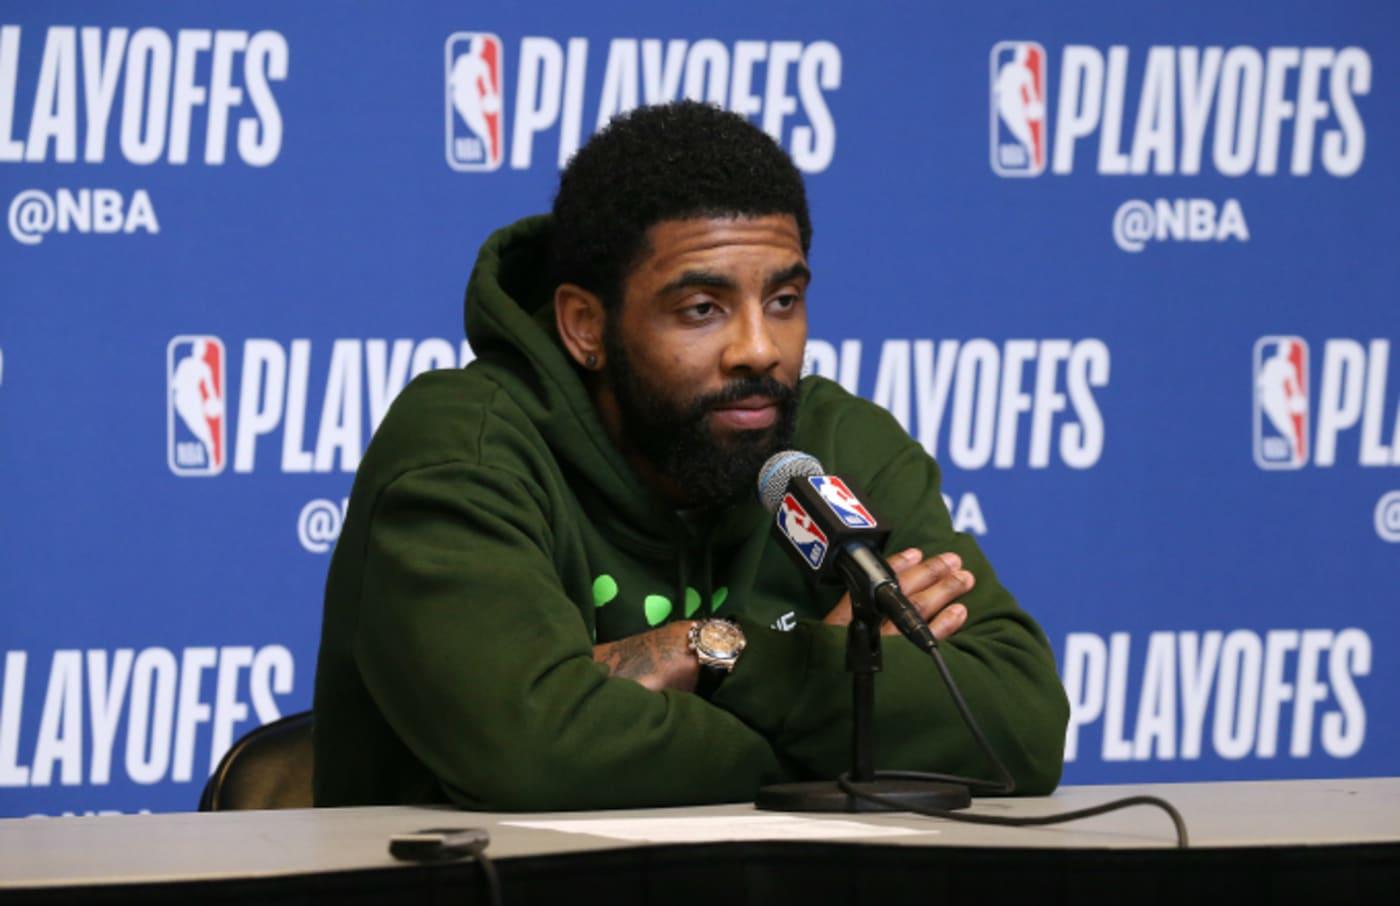 Kyrie Irving #11 of the Boston Celtics speaks to the media